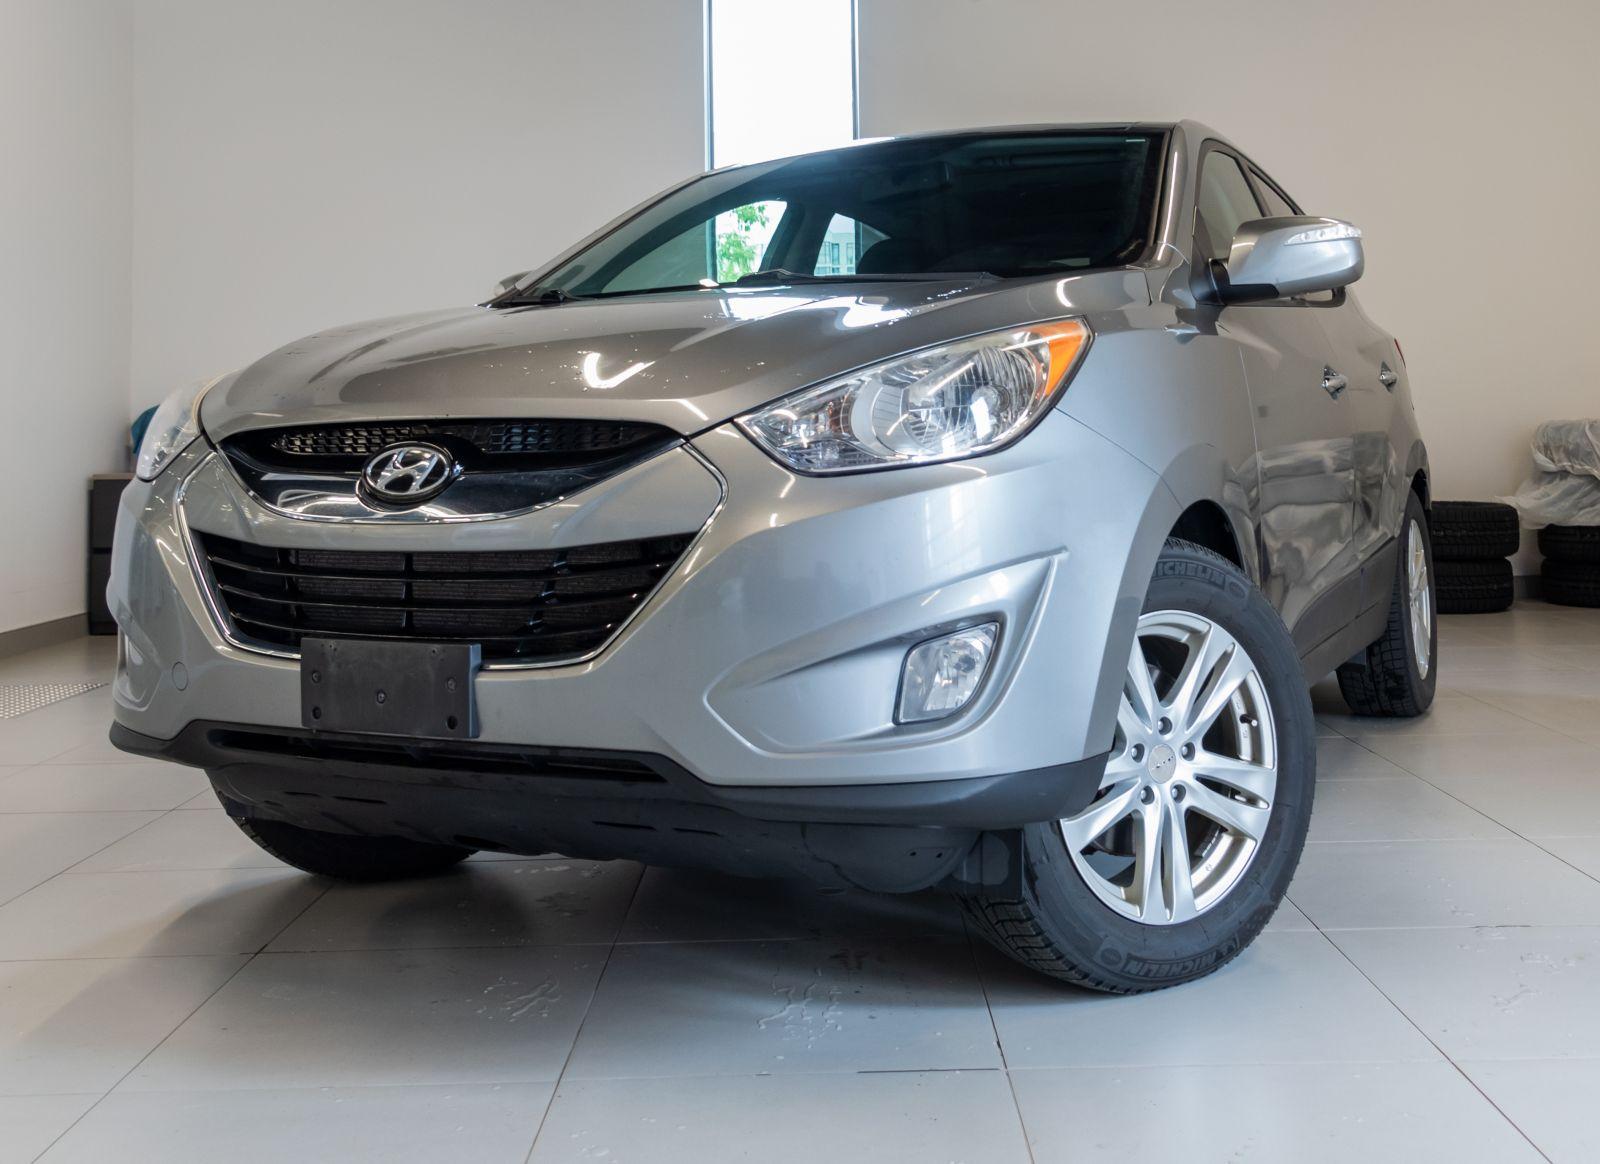 2011 Hyundai Tucson Image